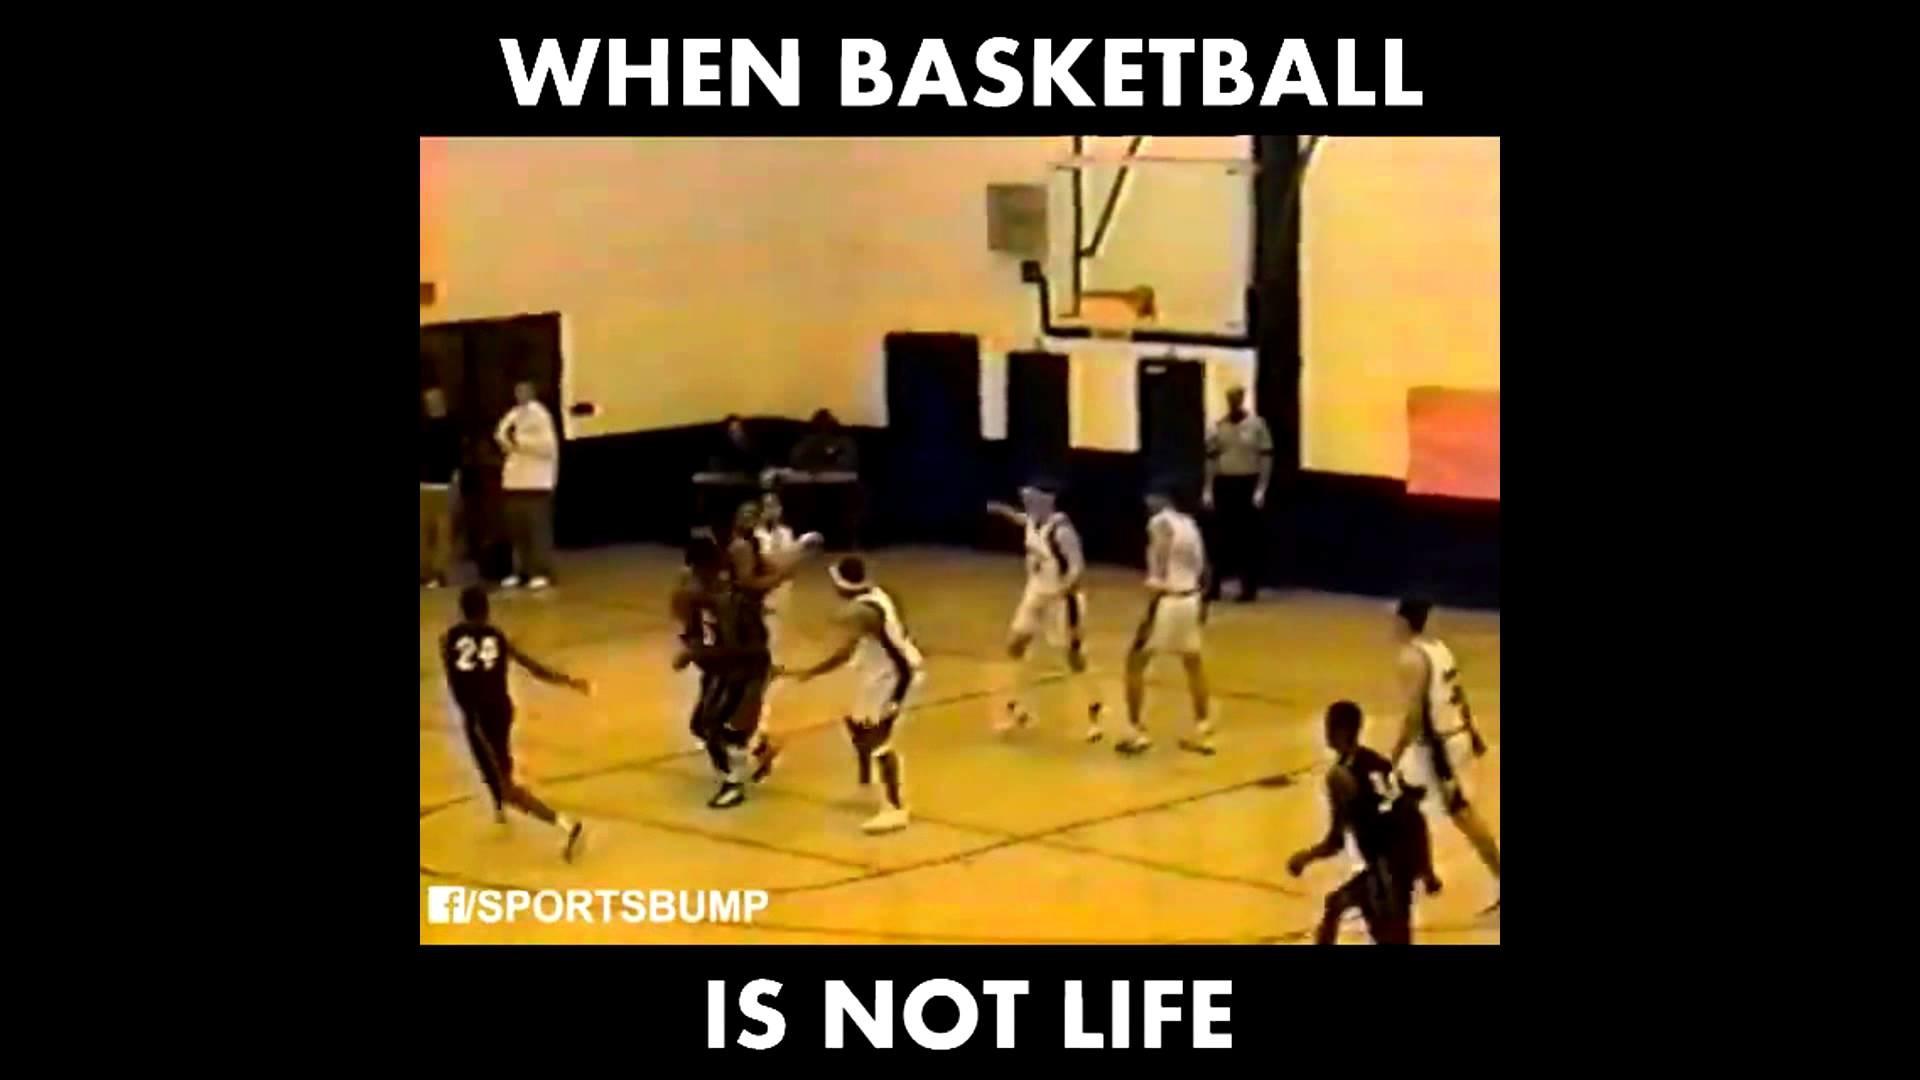 When Basketballl is Not Life   FUNNY When Ball Isn't Life Video!   # BallIsLife Fail